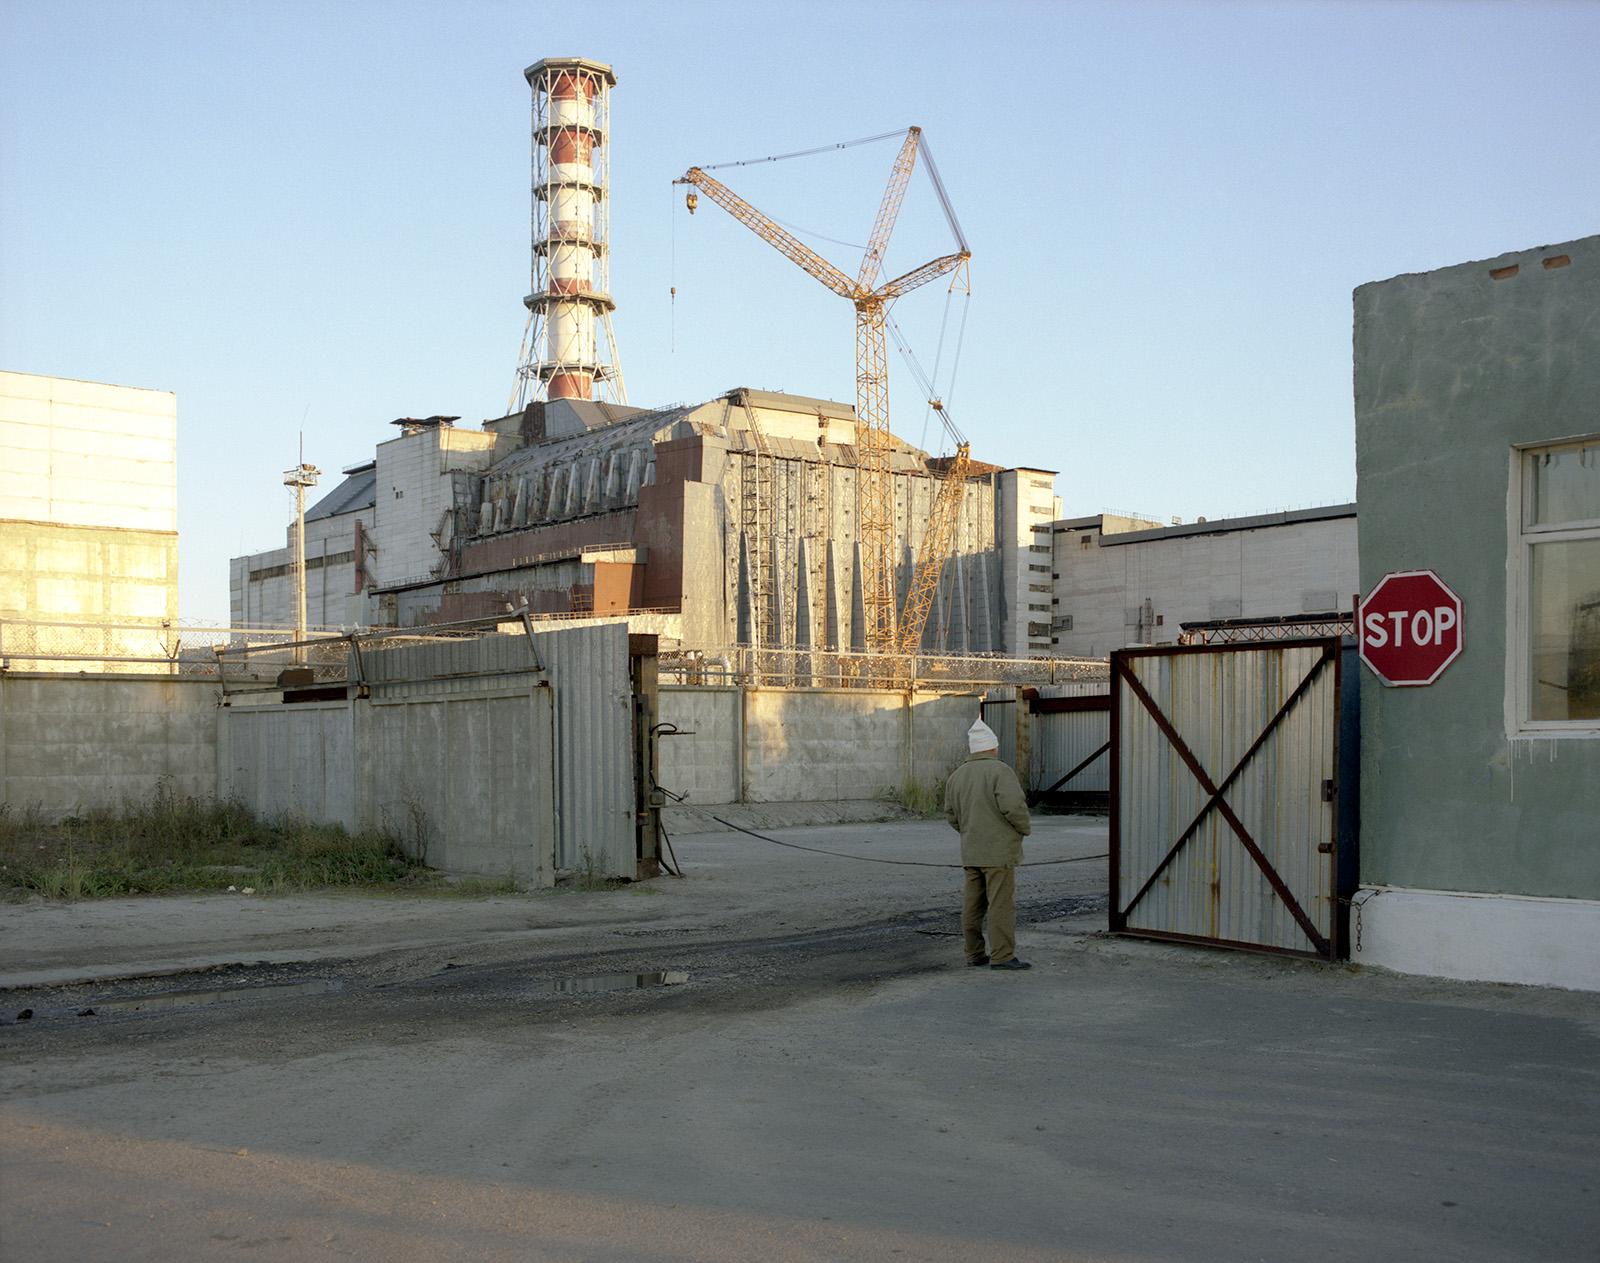 Chernobyl photographs: David McMillan documents a quarter